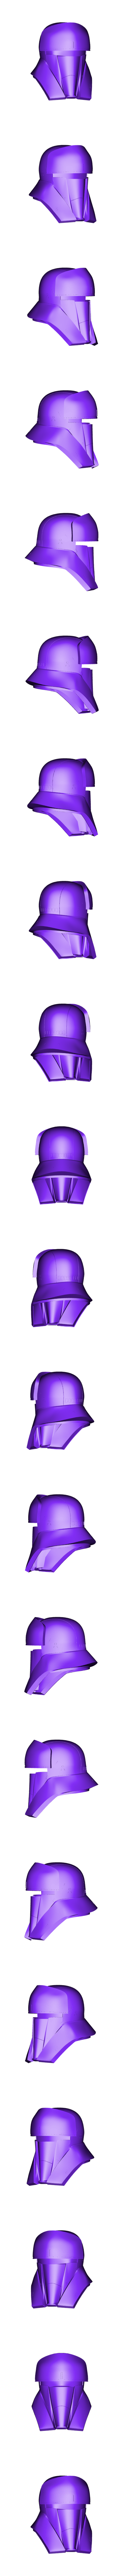 Tank_Trooper_Helmet_Complete_v1.stl Download free STL file Tank Trooper Helmet Star Wars Rogue One • 3D printer template, VillainousPropShop